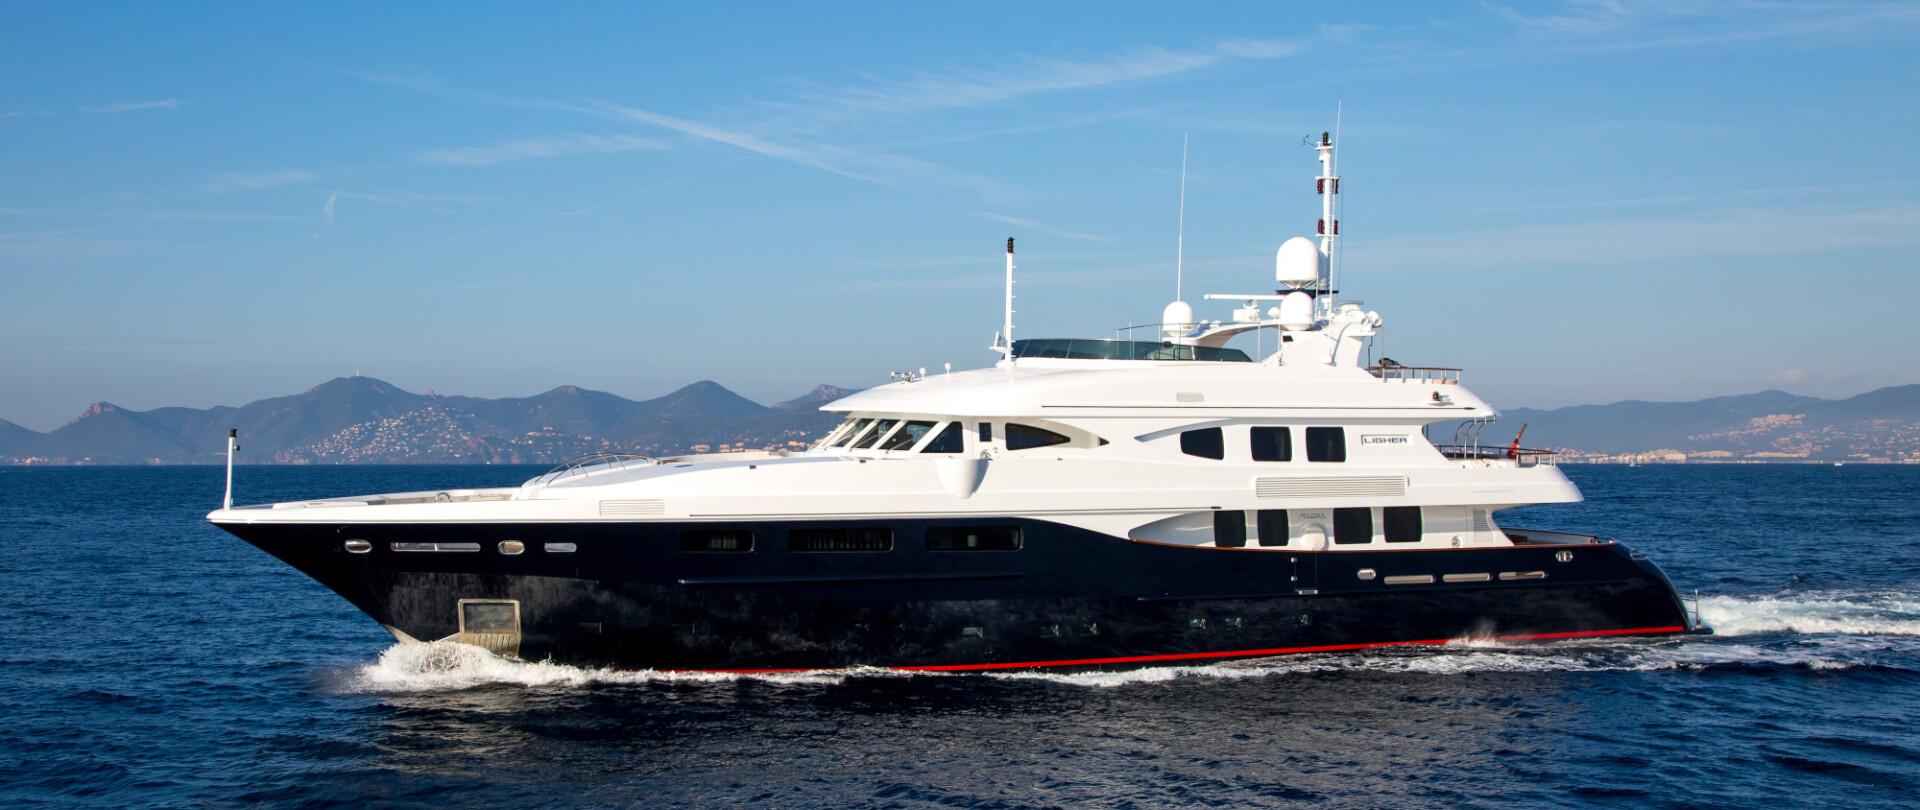 Yacht sold, Lighea photo 1